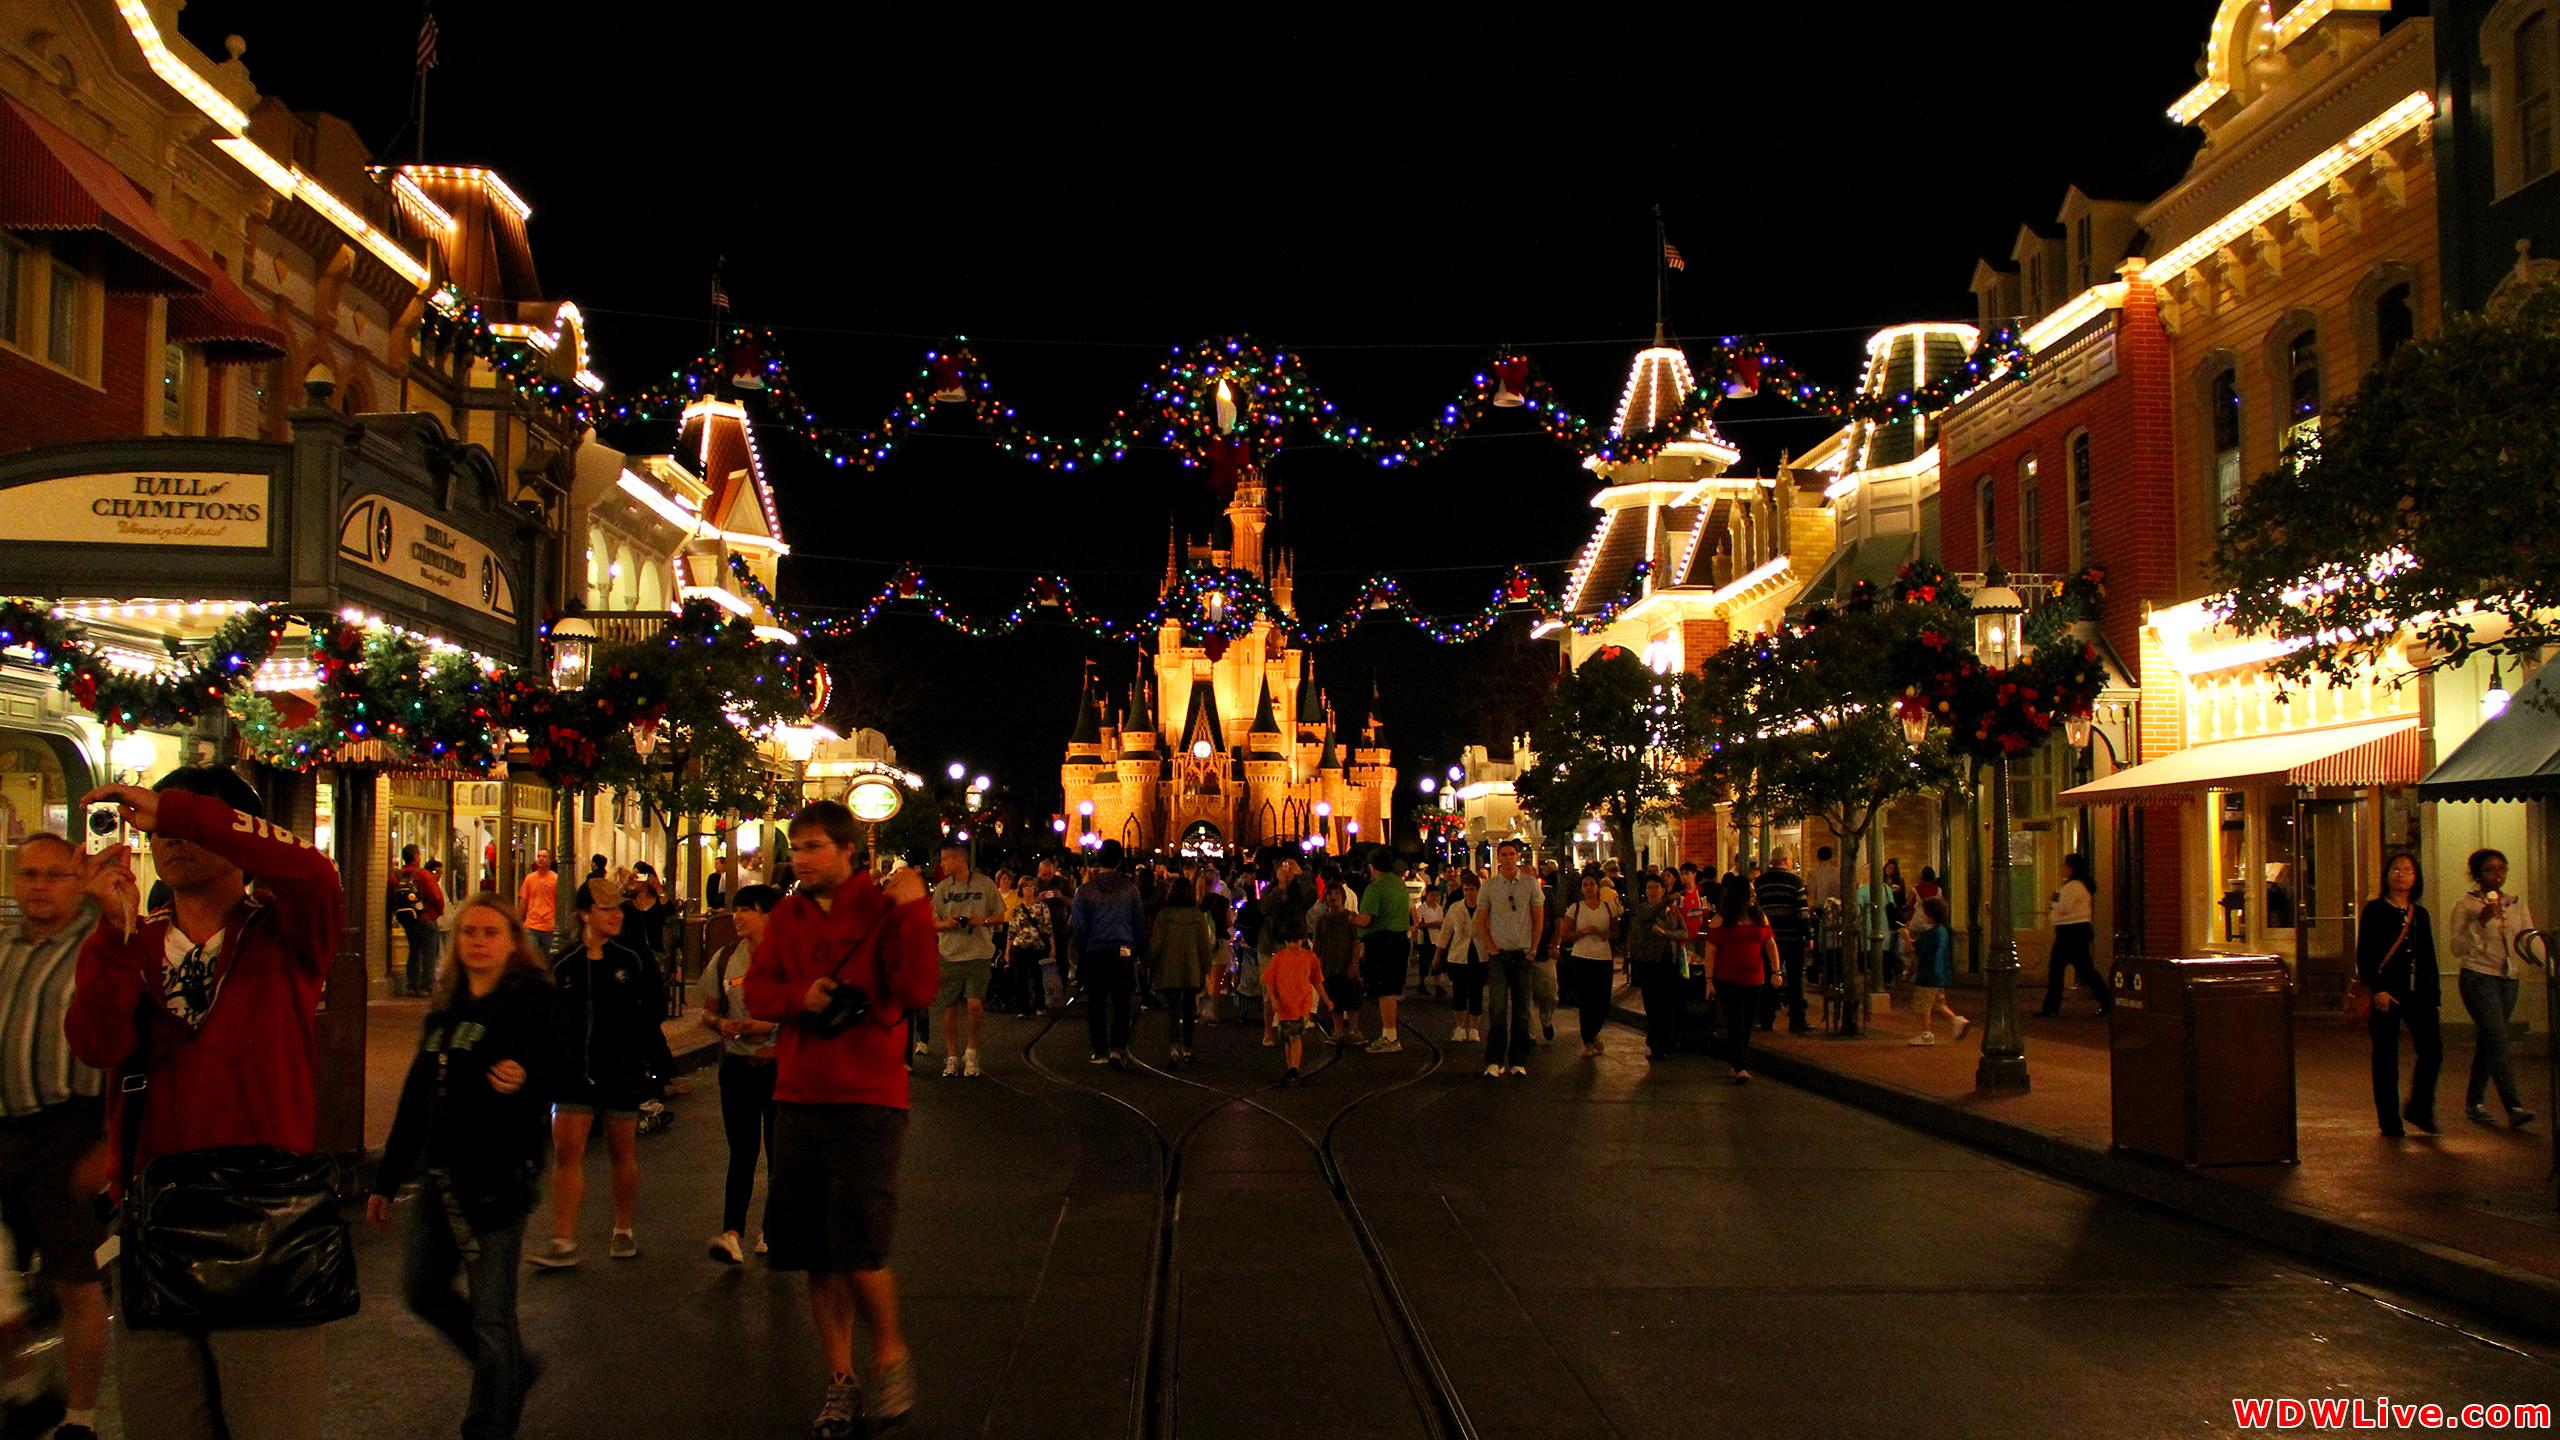 Christmas Decorations Christmas nighttime view of Main Street USA 2560x1440